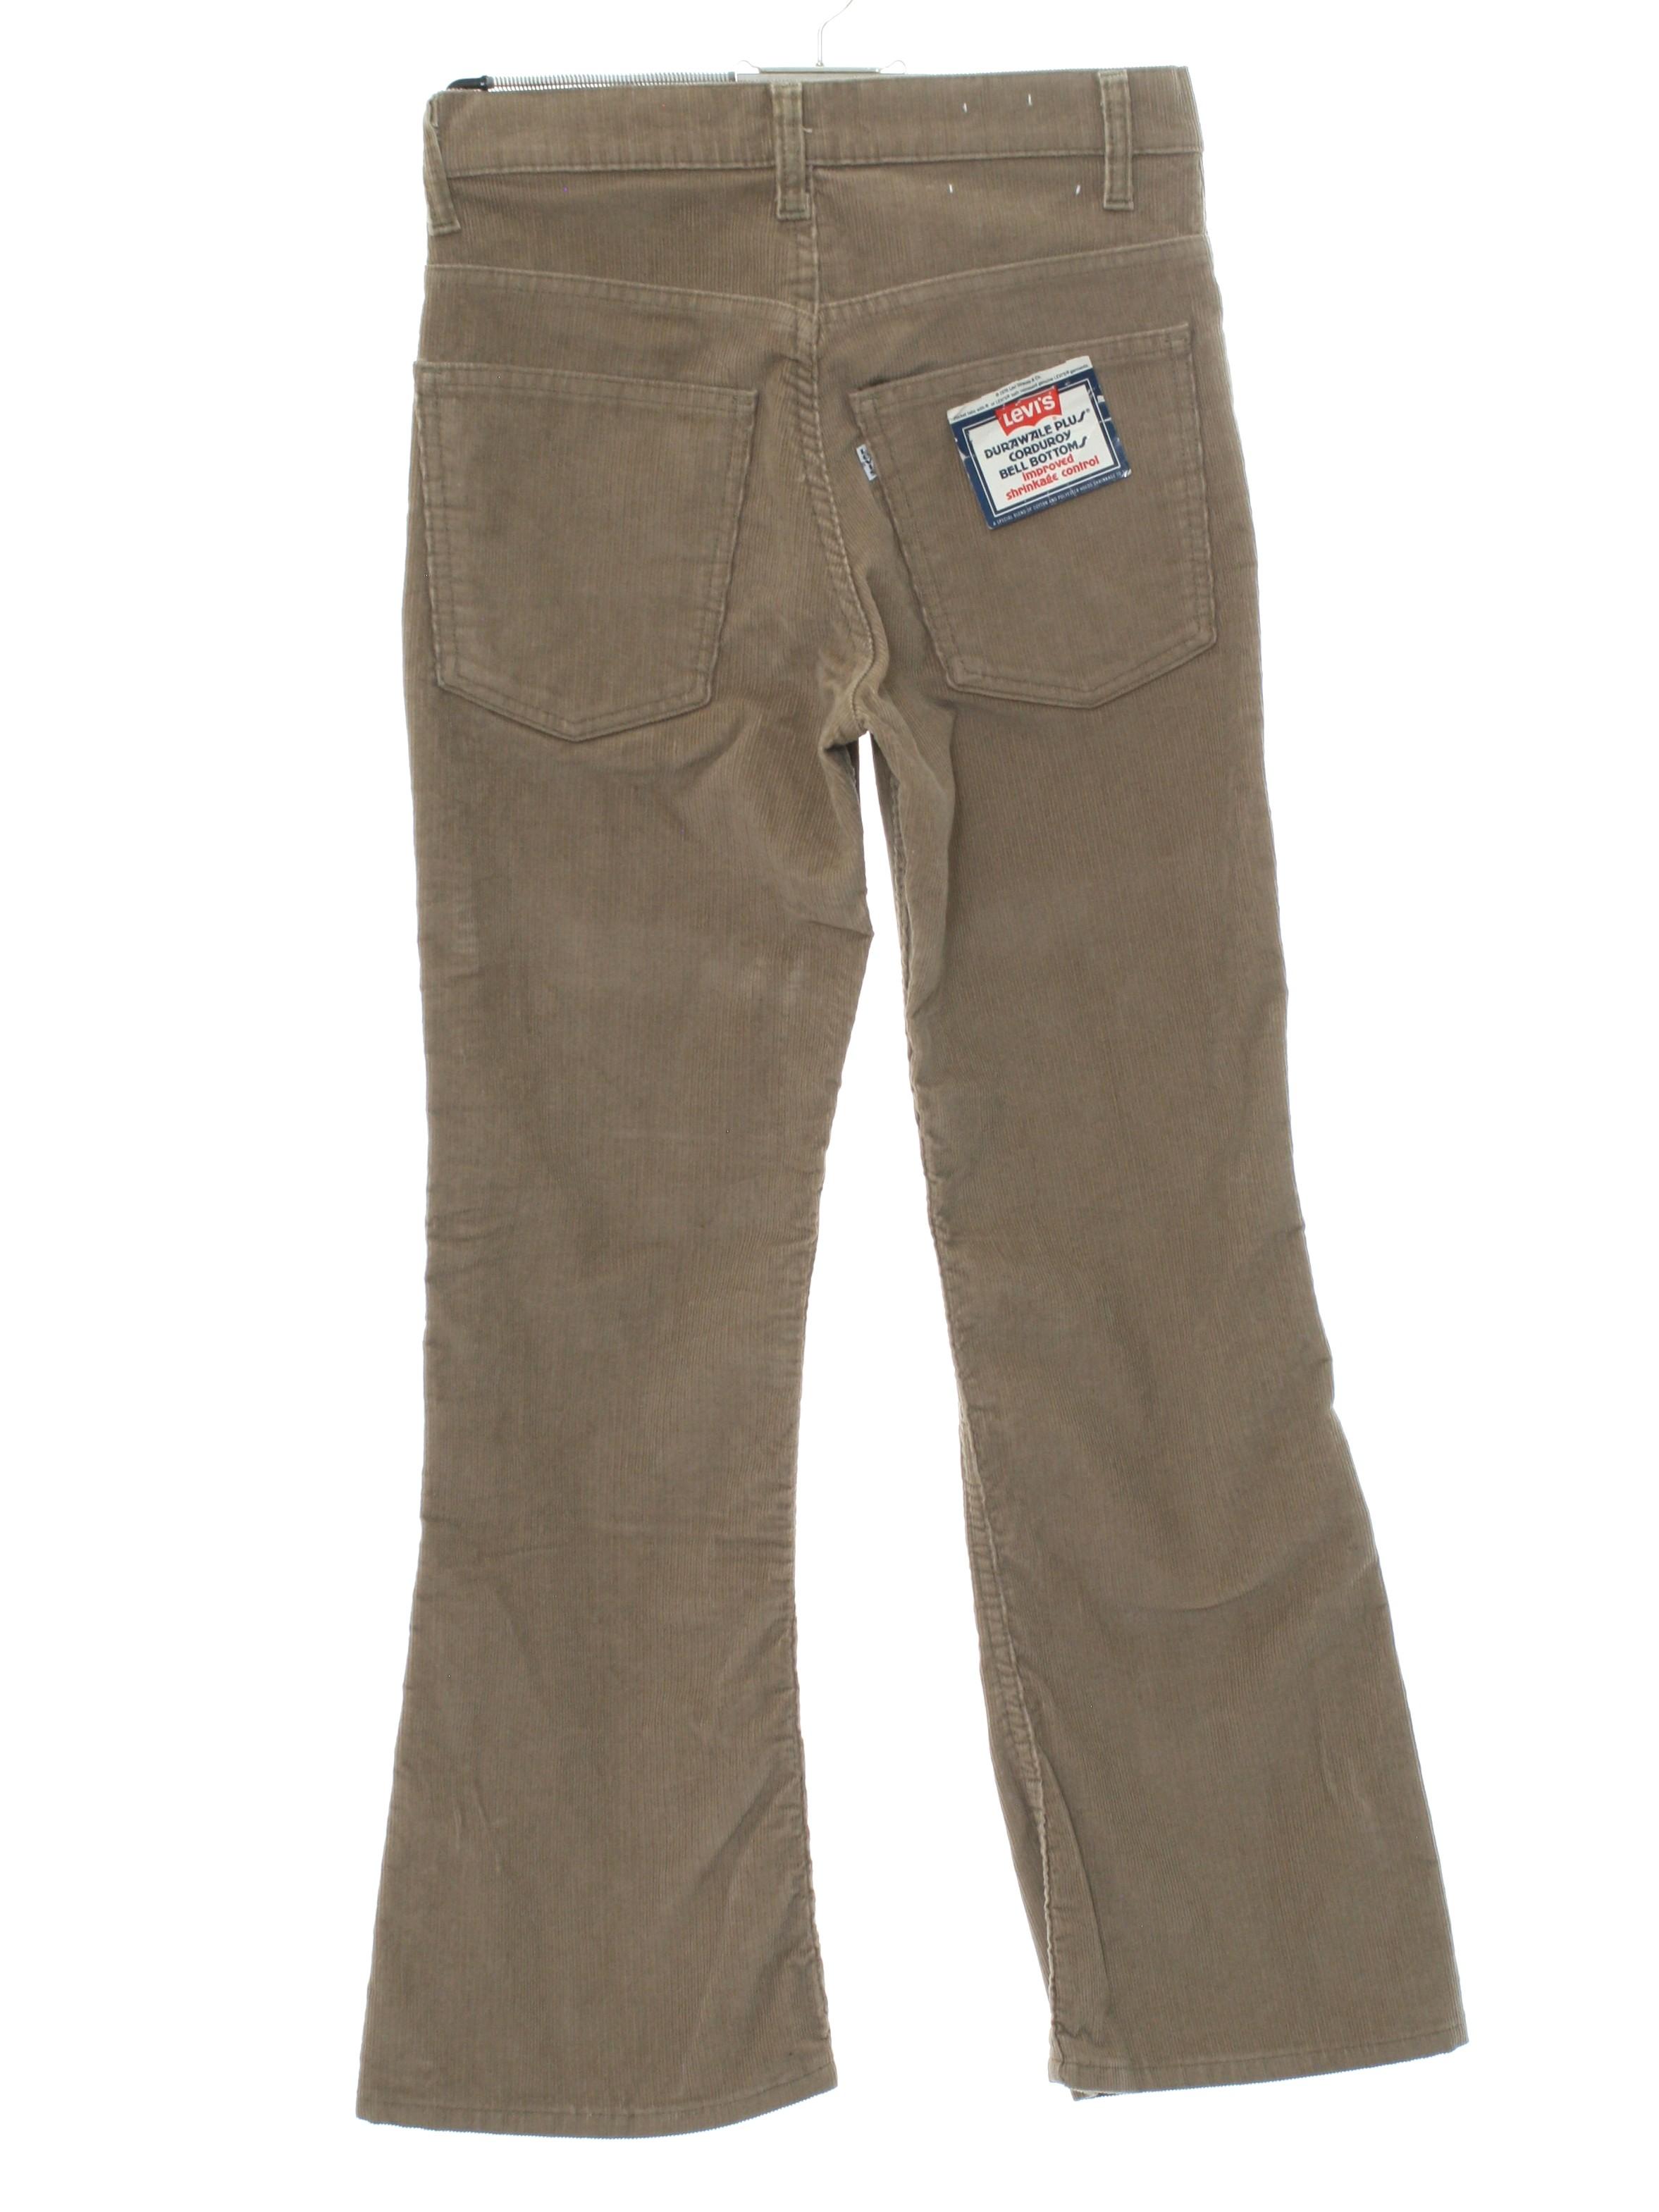 in stock new authentic reliable reputation 1970's Levis Durawale Plus 646 Levis Durwale 646 Unisex Levis Rare 646  Bellbottom Corduroy Jeans Pants